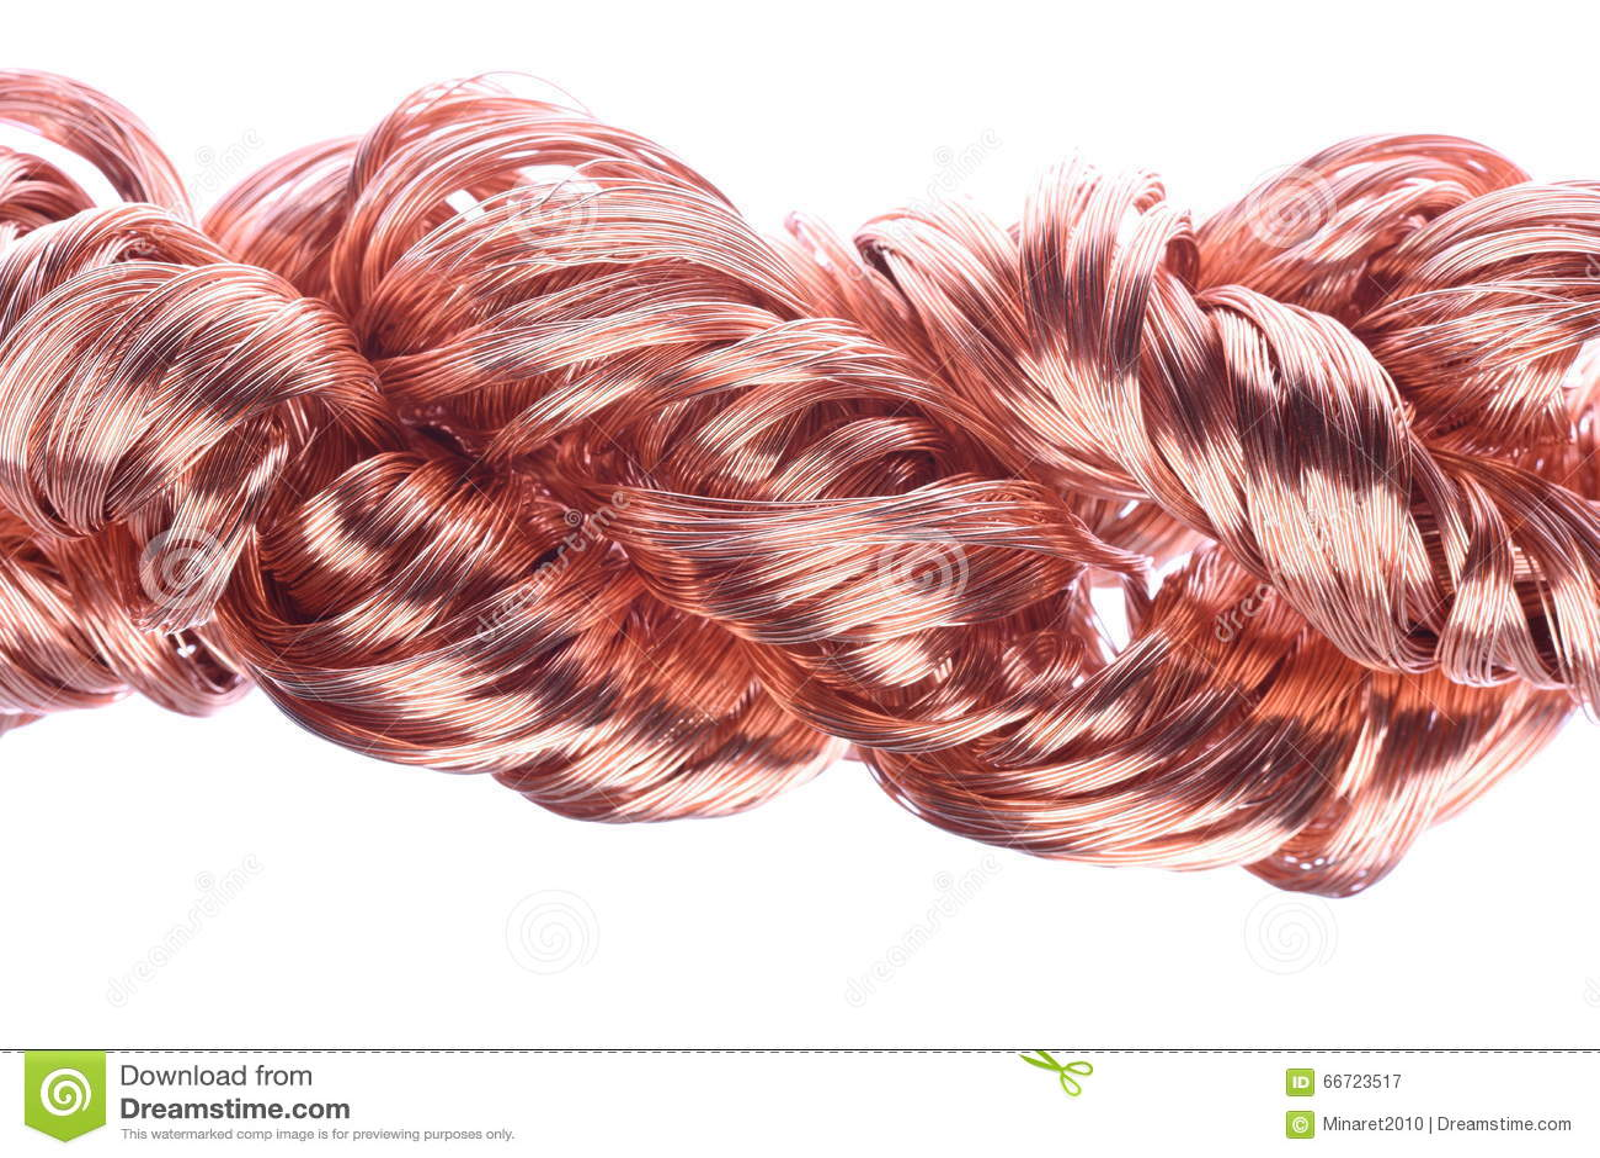 Koppartrådar